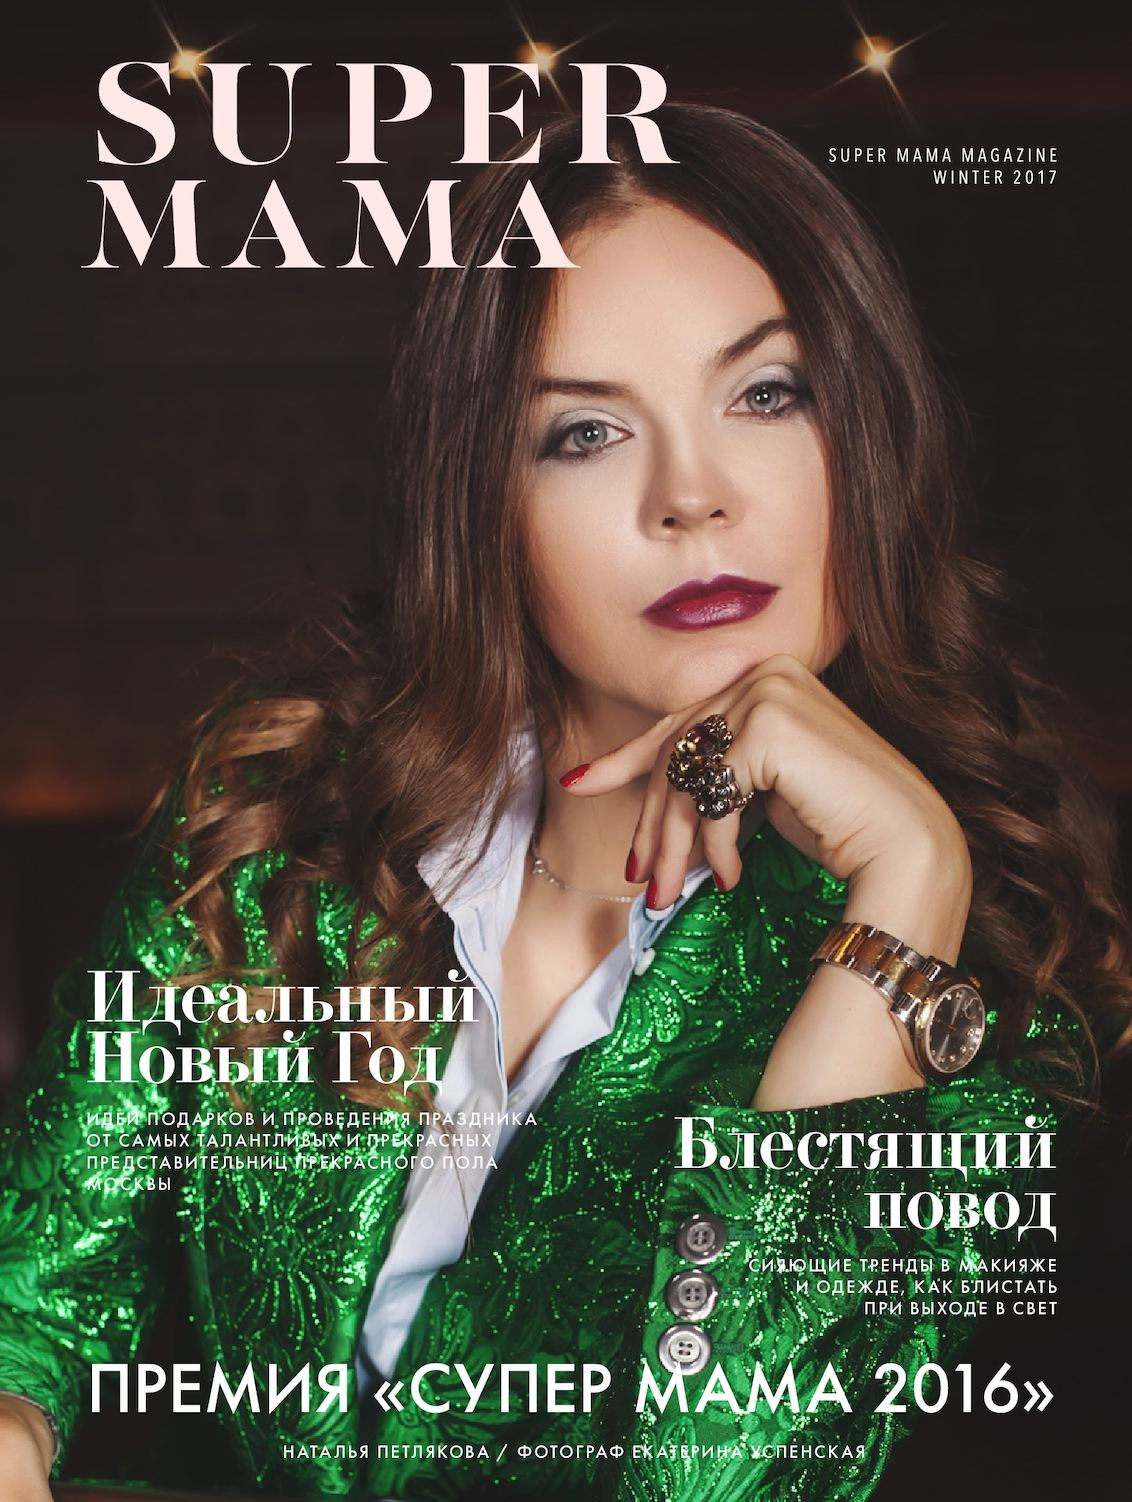 Super Mama Issuu 1 Moscow 2